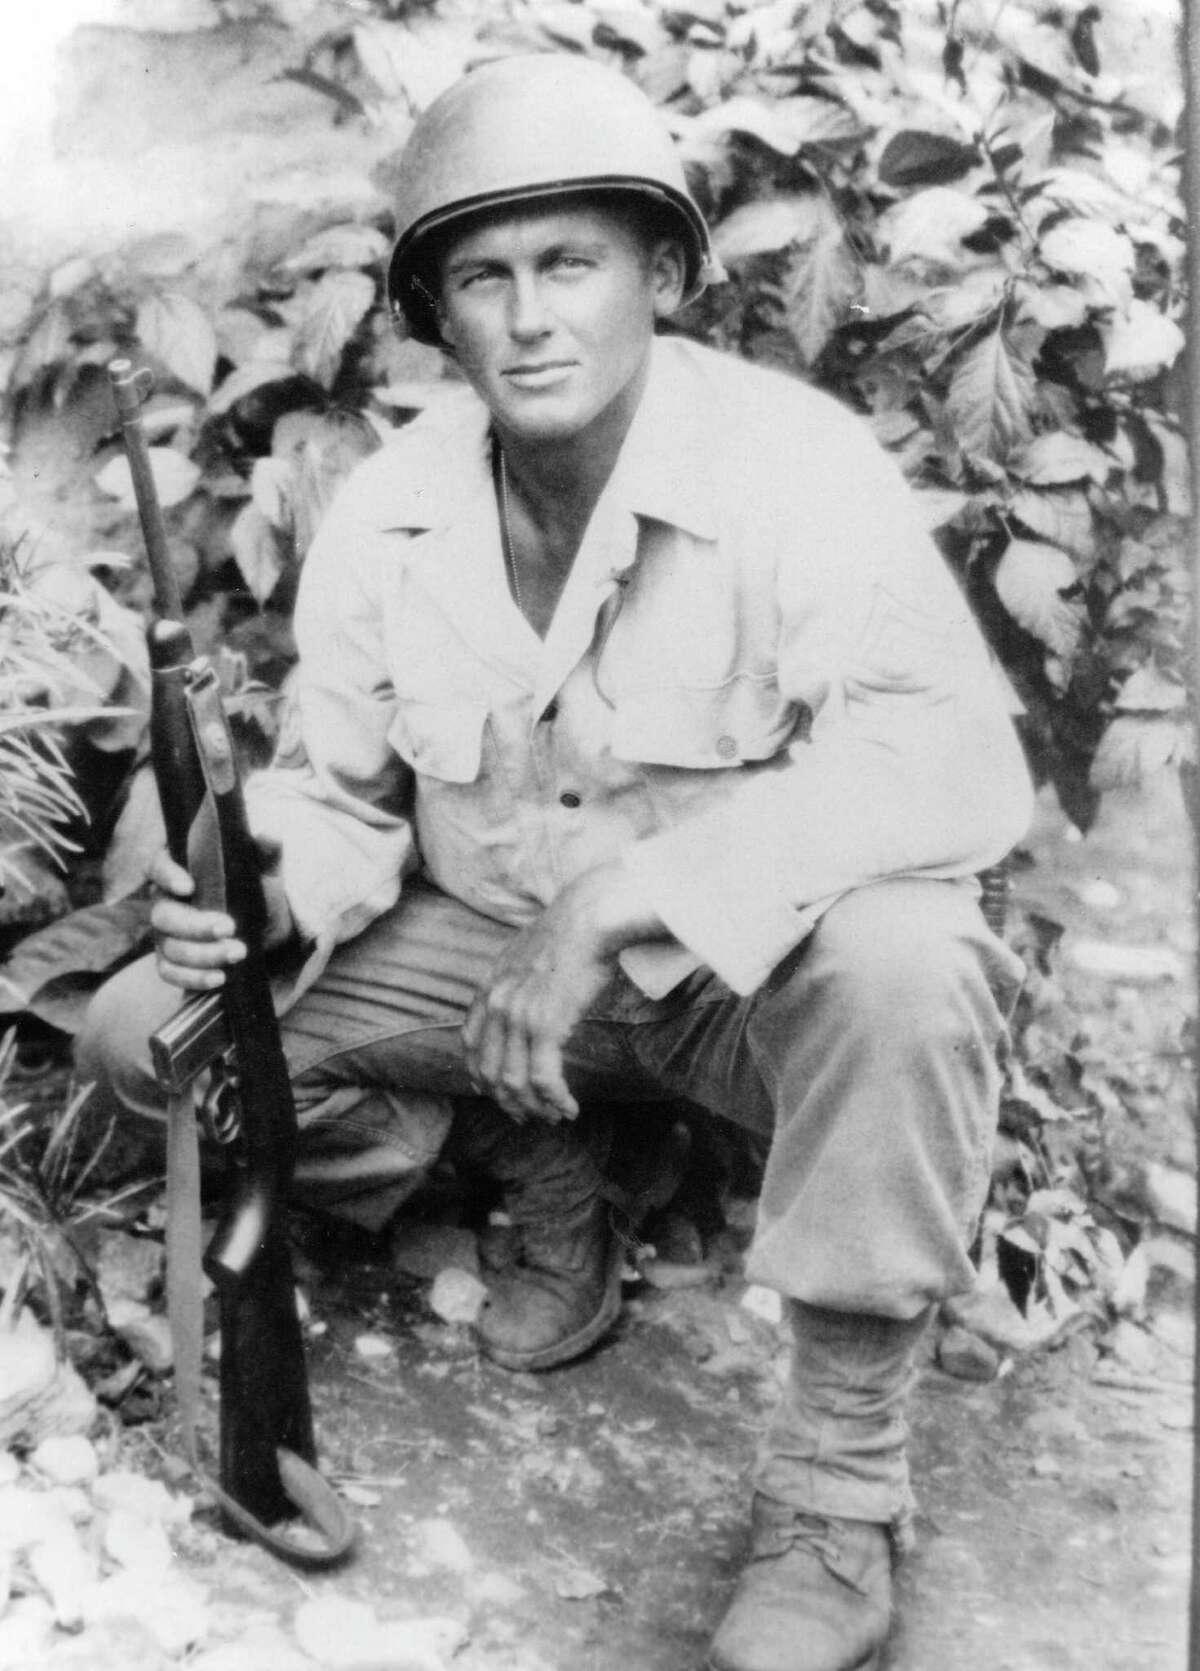 Woodrow Charles Schmidt